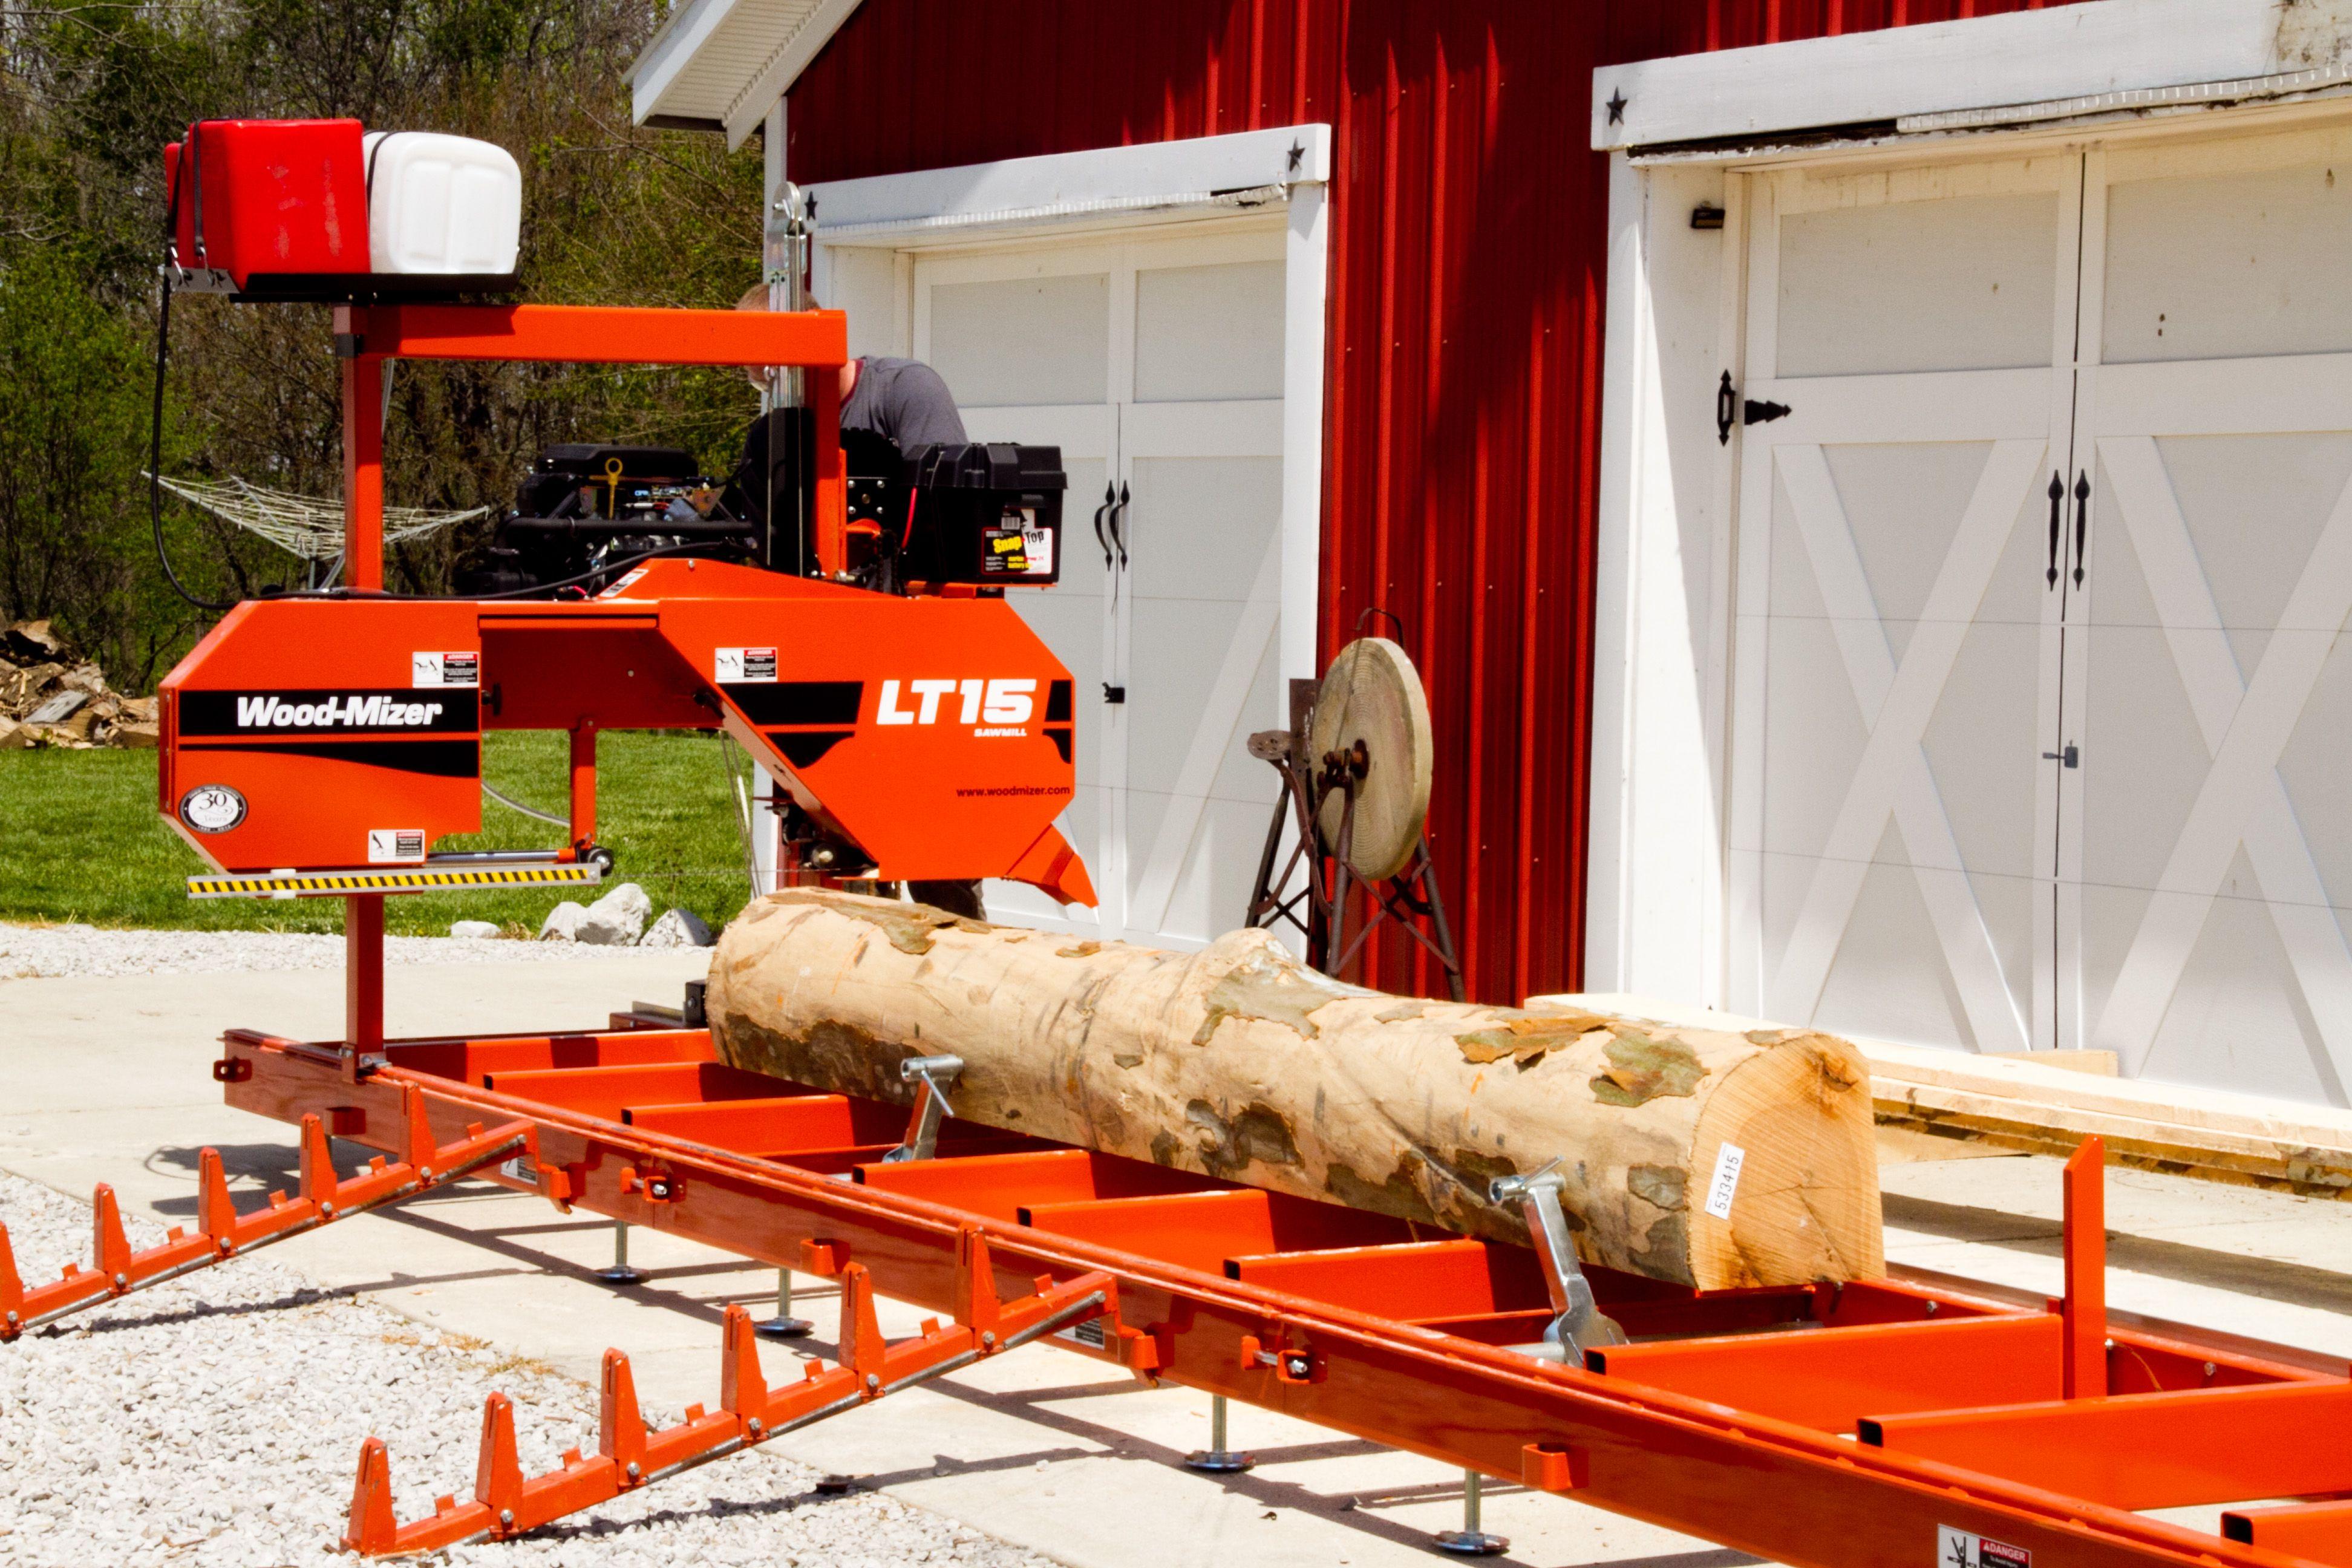 LT15 - The World Standard in manual, stationary sawmills